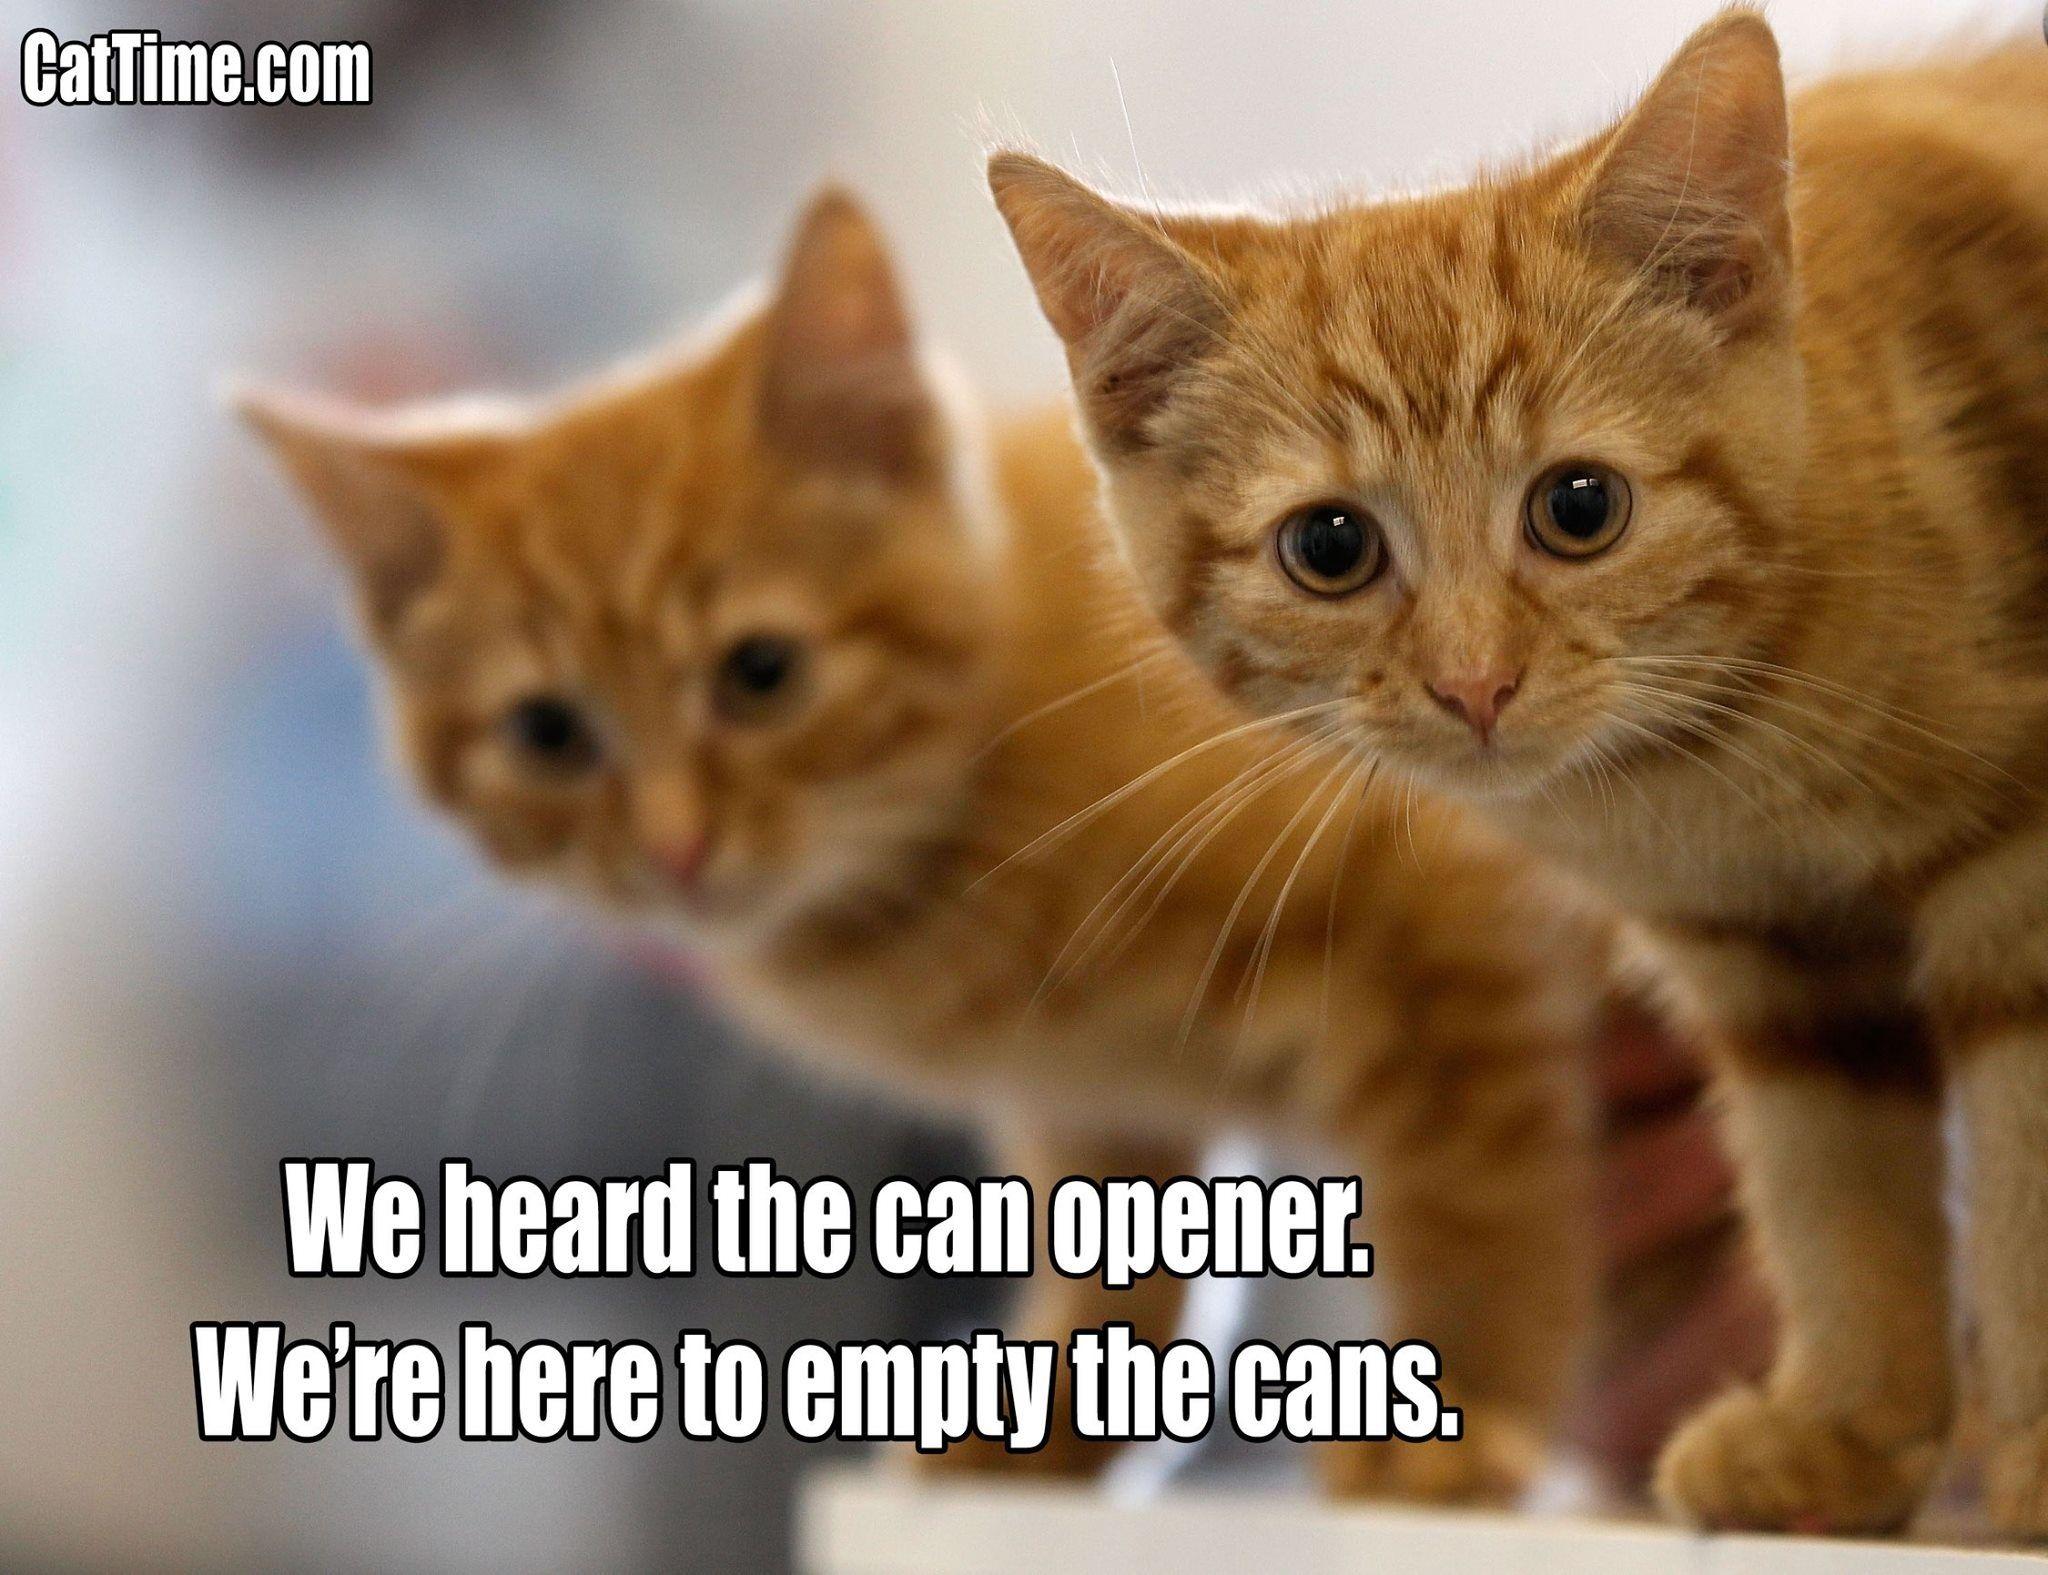 28 funny heartwarming shareworthy cat memes gallery